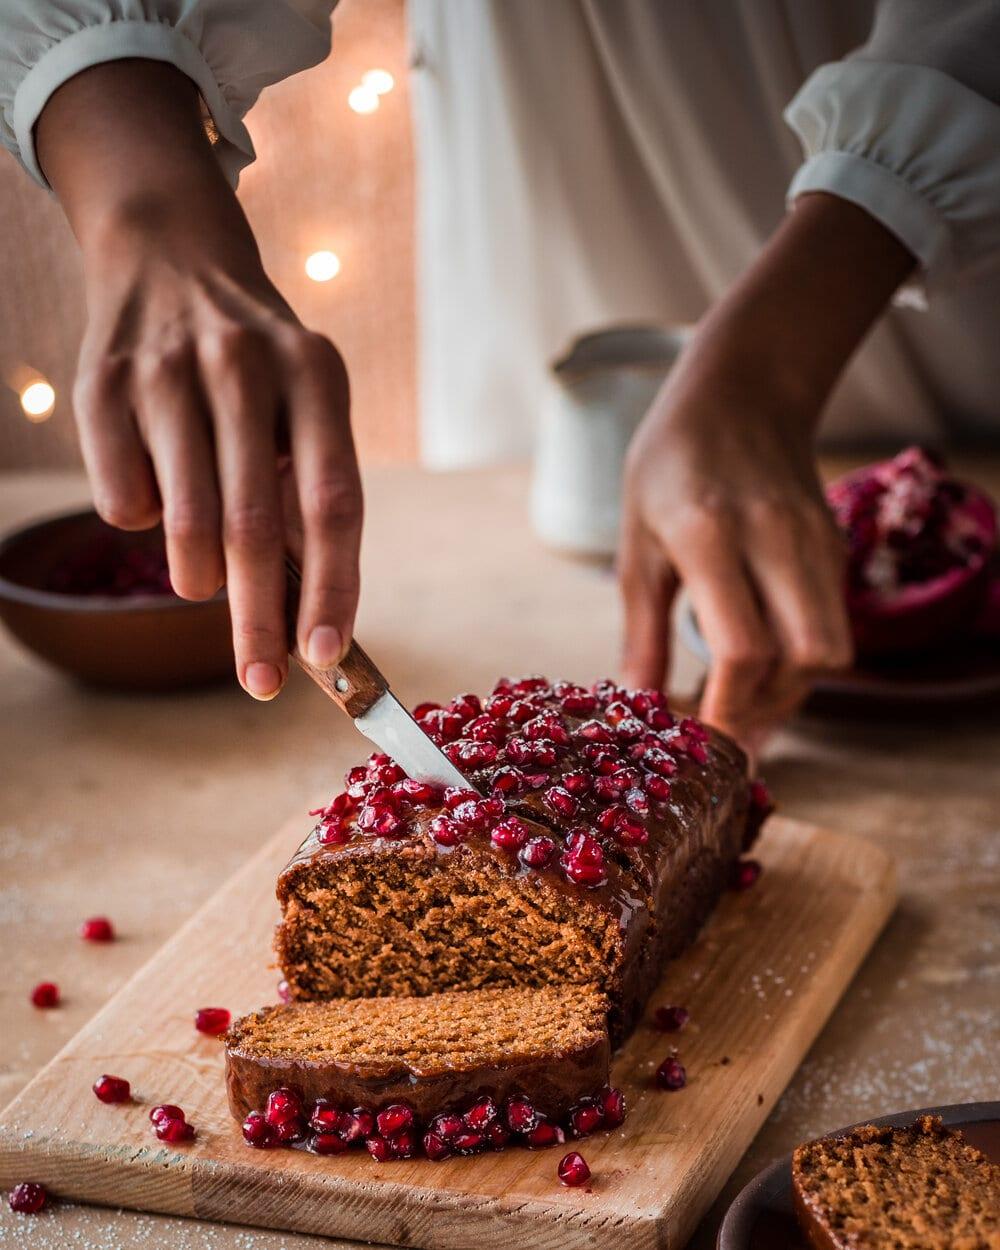 gingerbread cake slicing.jpg